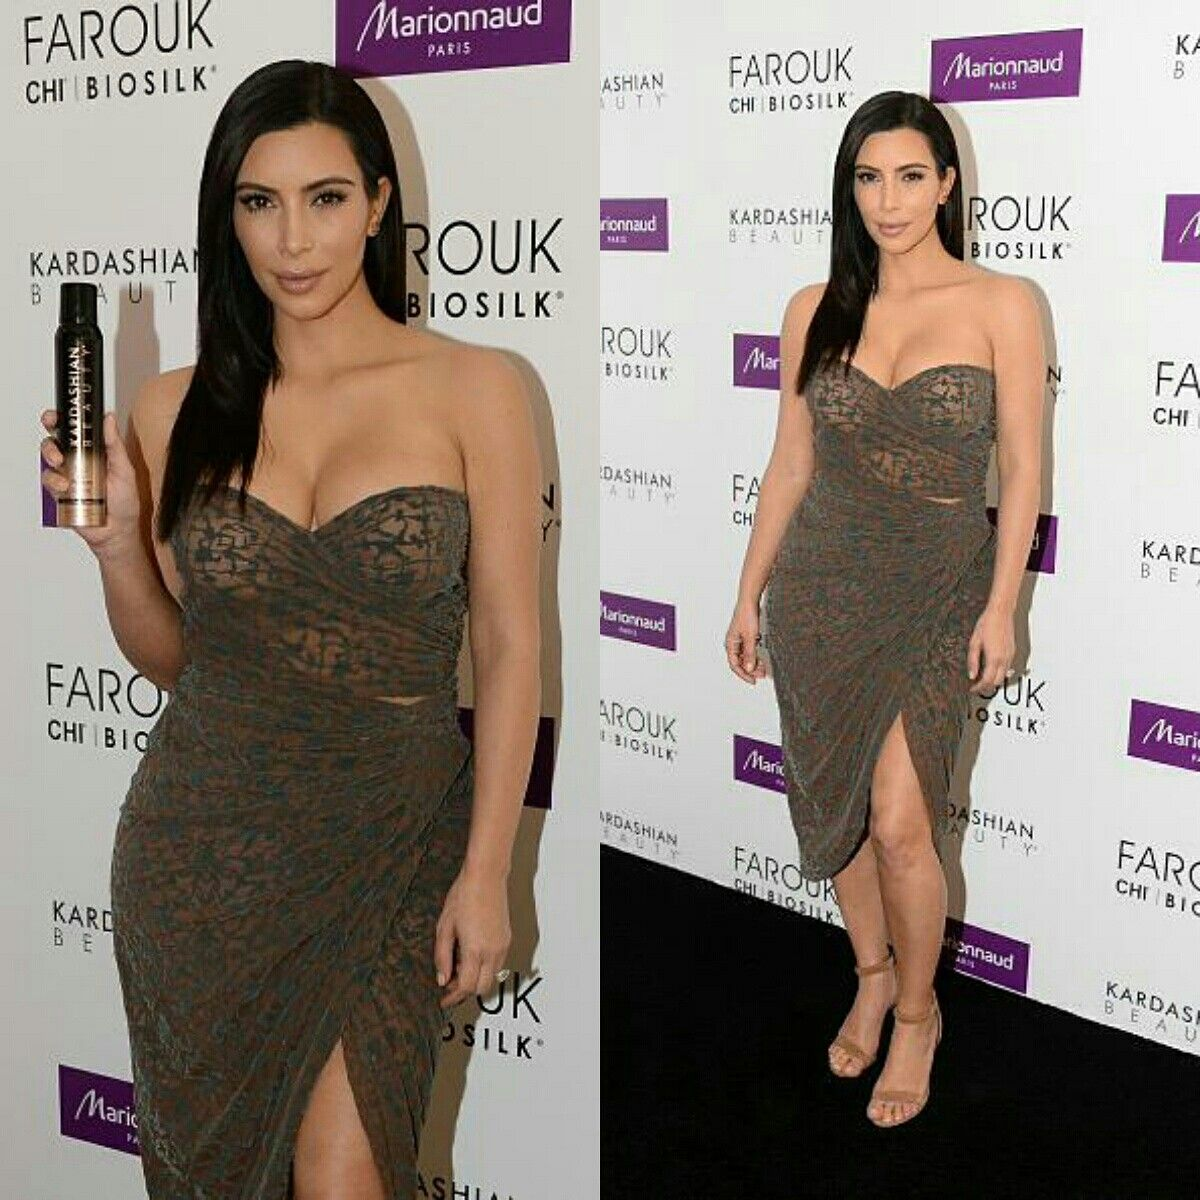 Kim Kardashian showcases her curves as she hits 120lbs